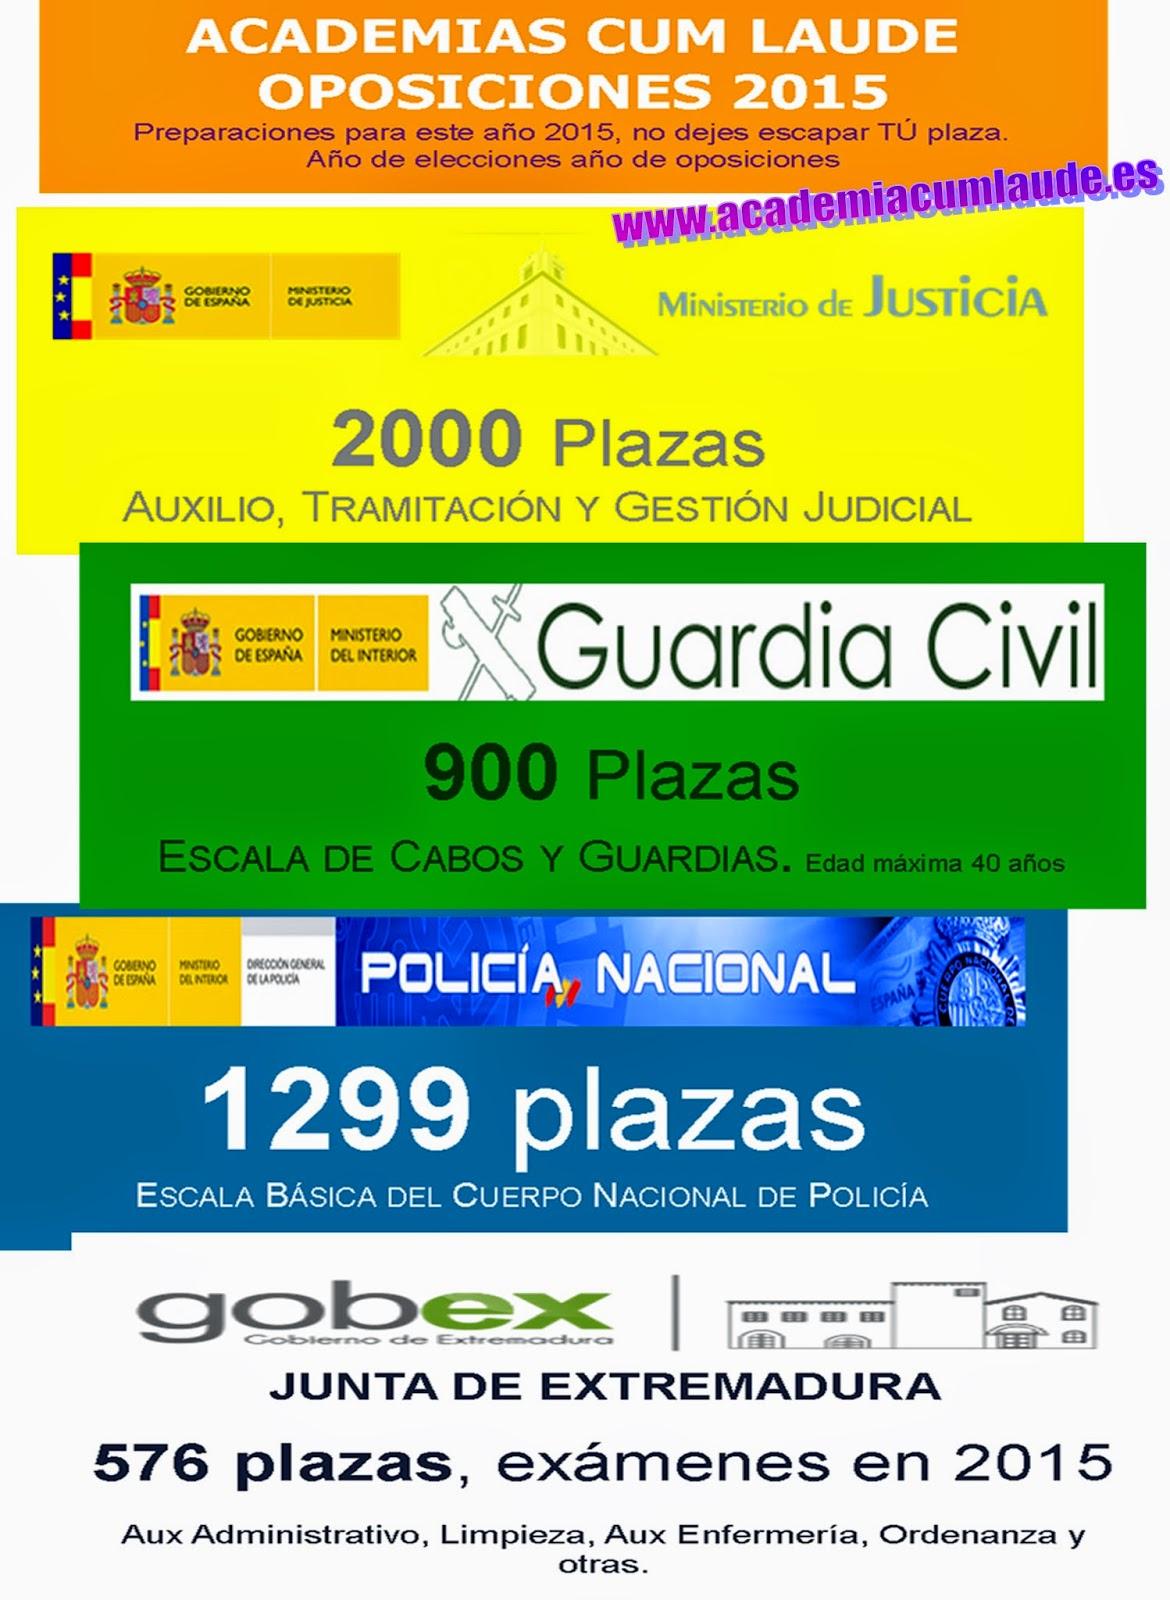 www.academiacumlaude.es